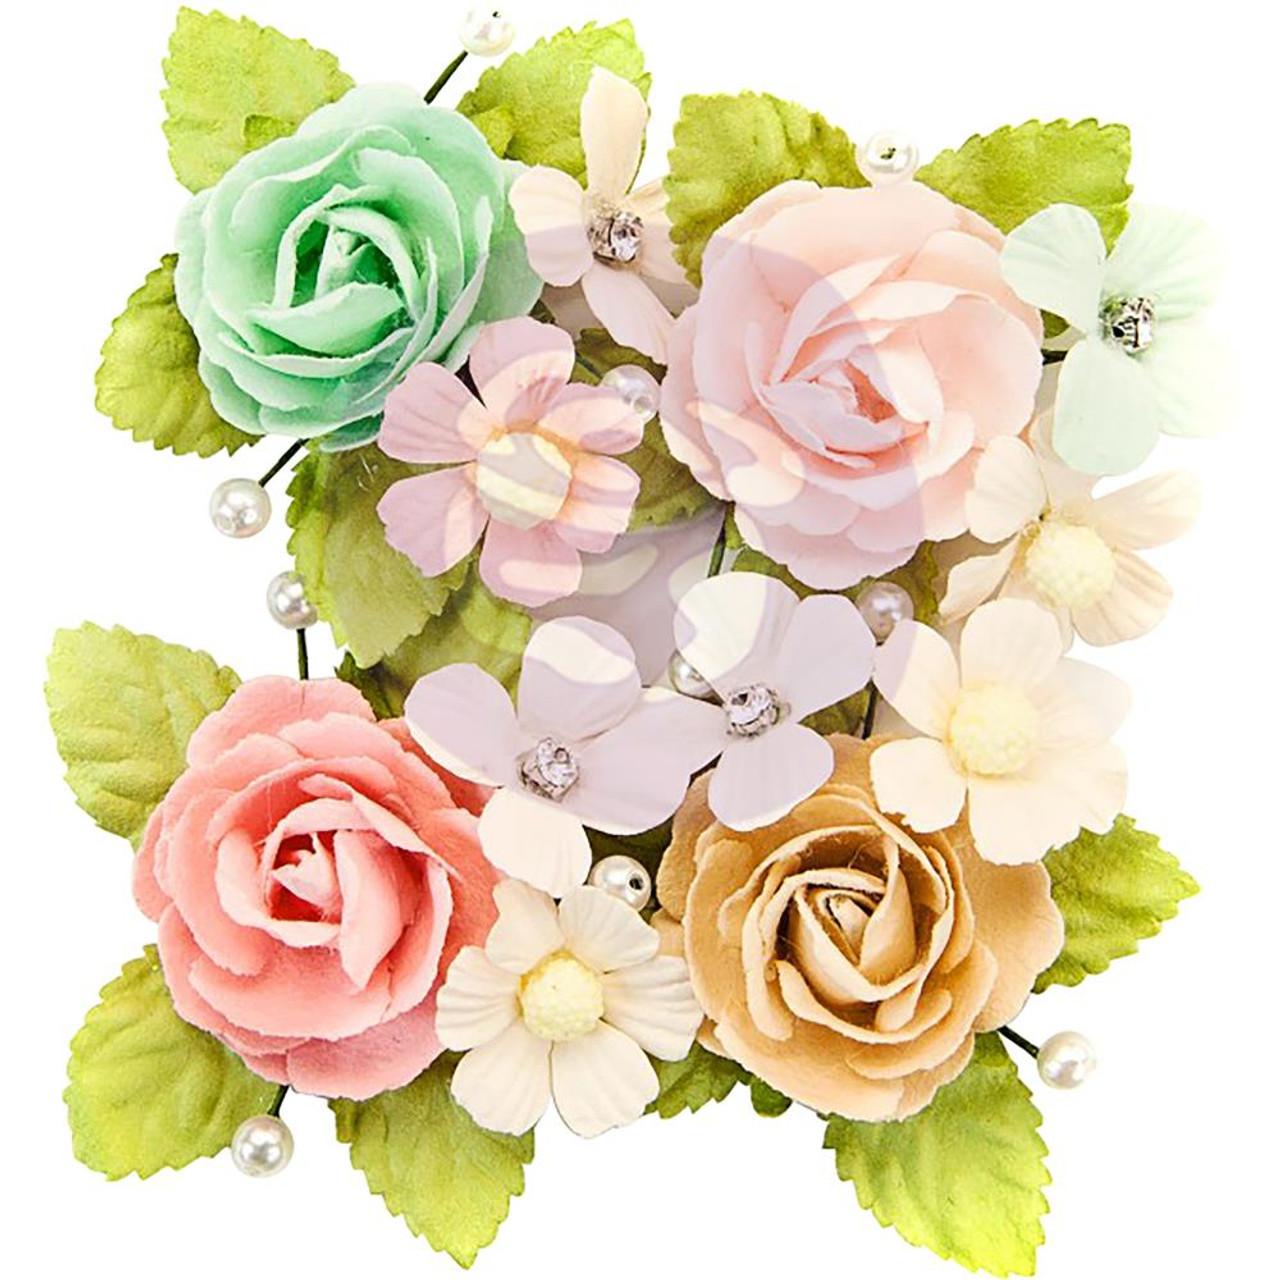 Prima Marketing Misty Rose Mulberry Paper Flowers 4pkg Paxton